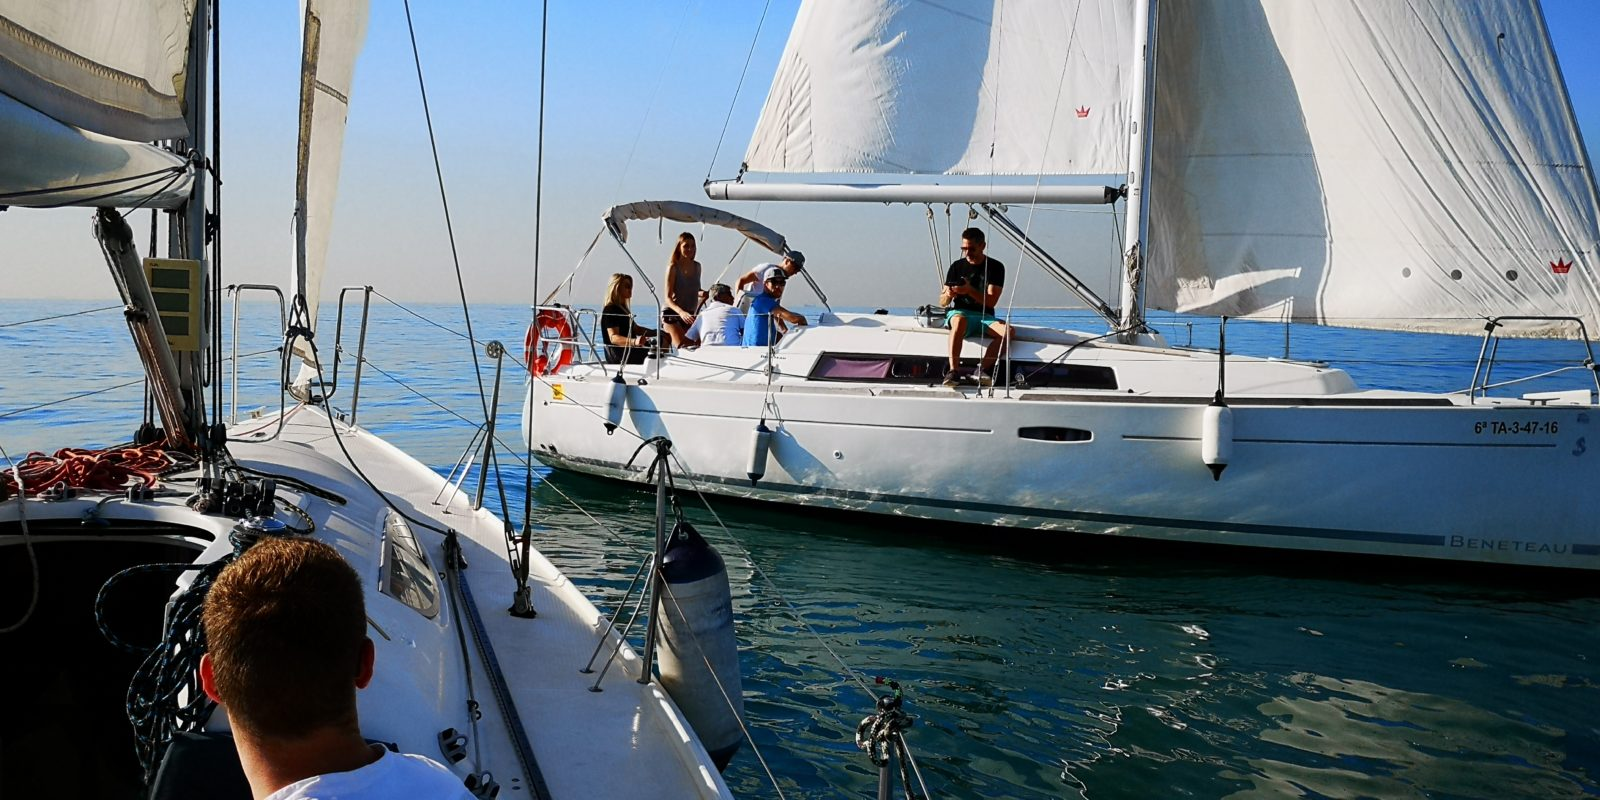 team building event boat tours regatta barcelona